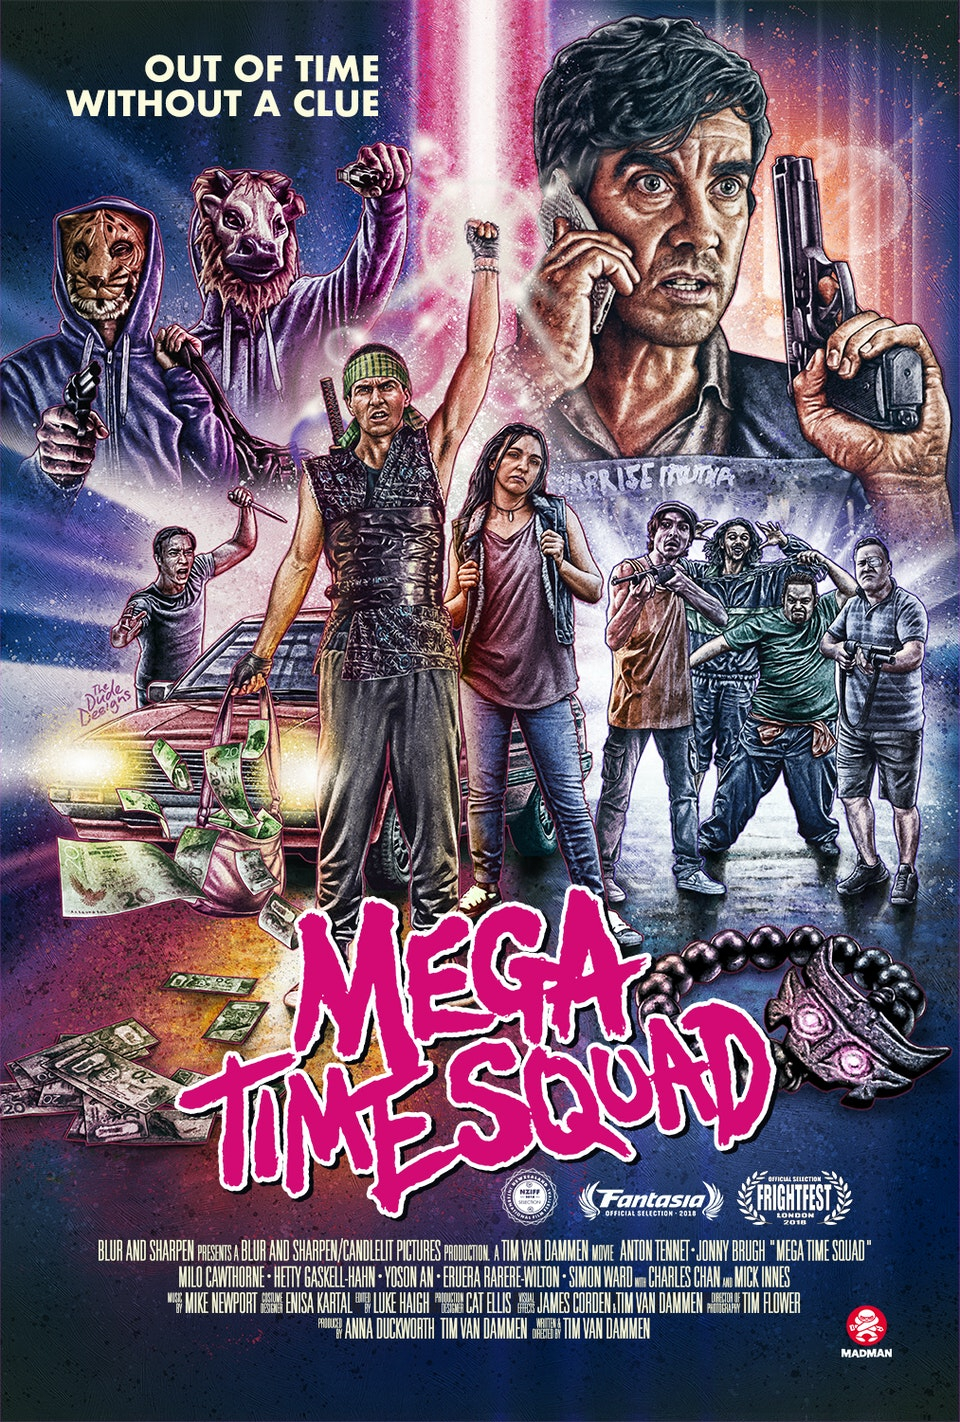 MEGA TIME SQUAD - Luke Haigh | Film Editor